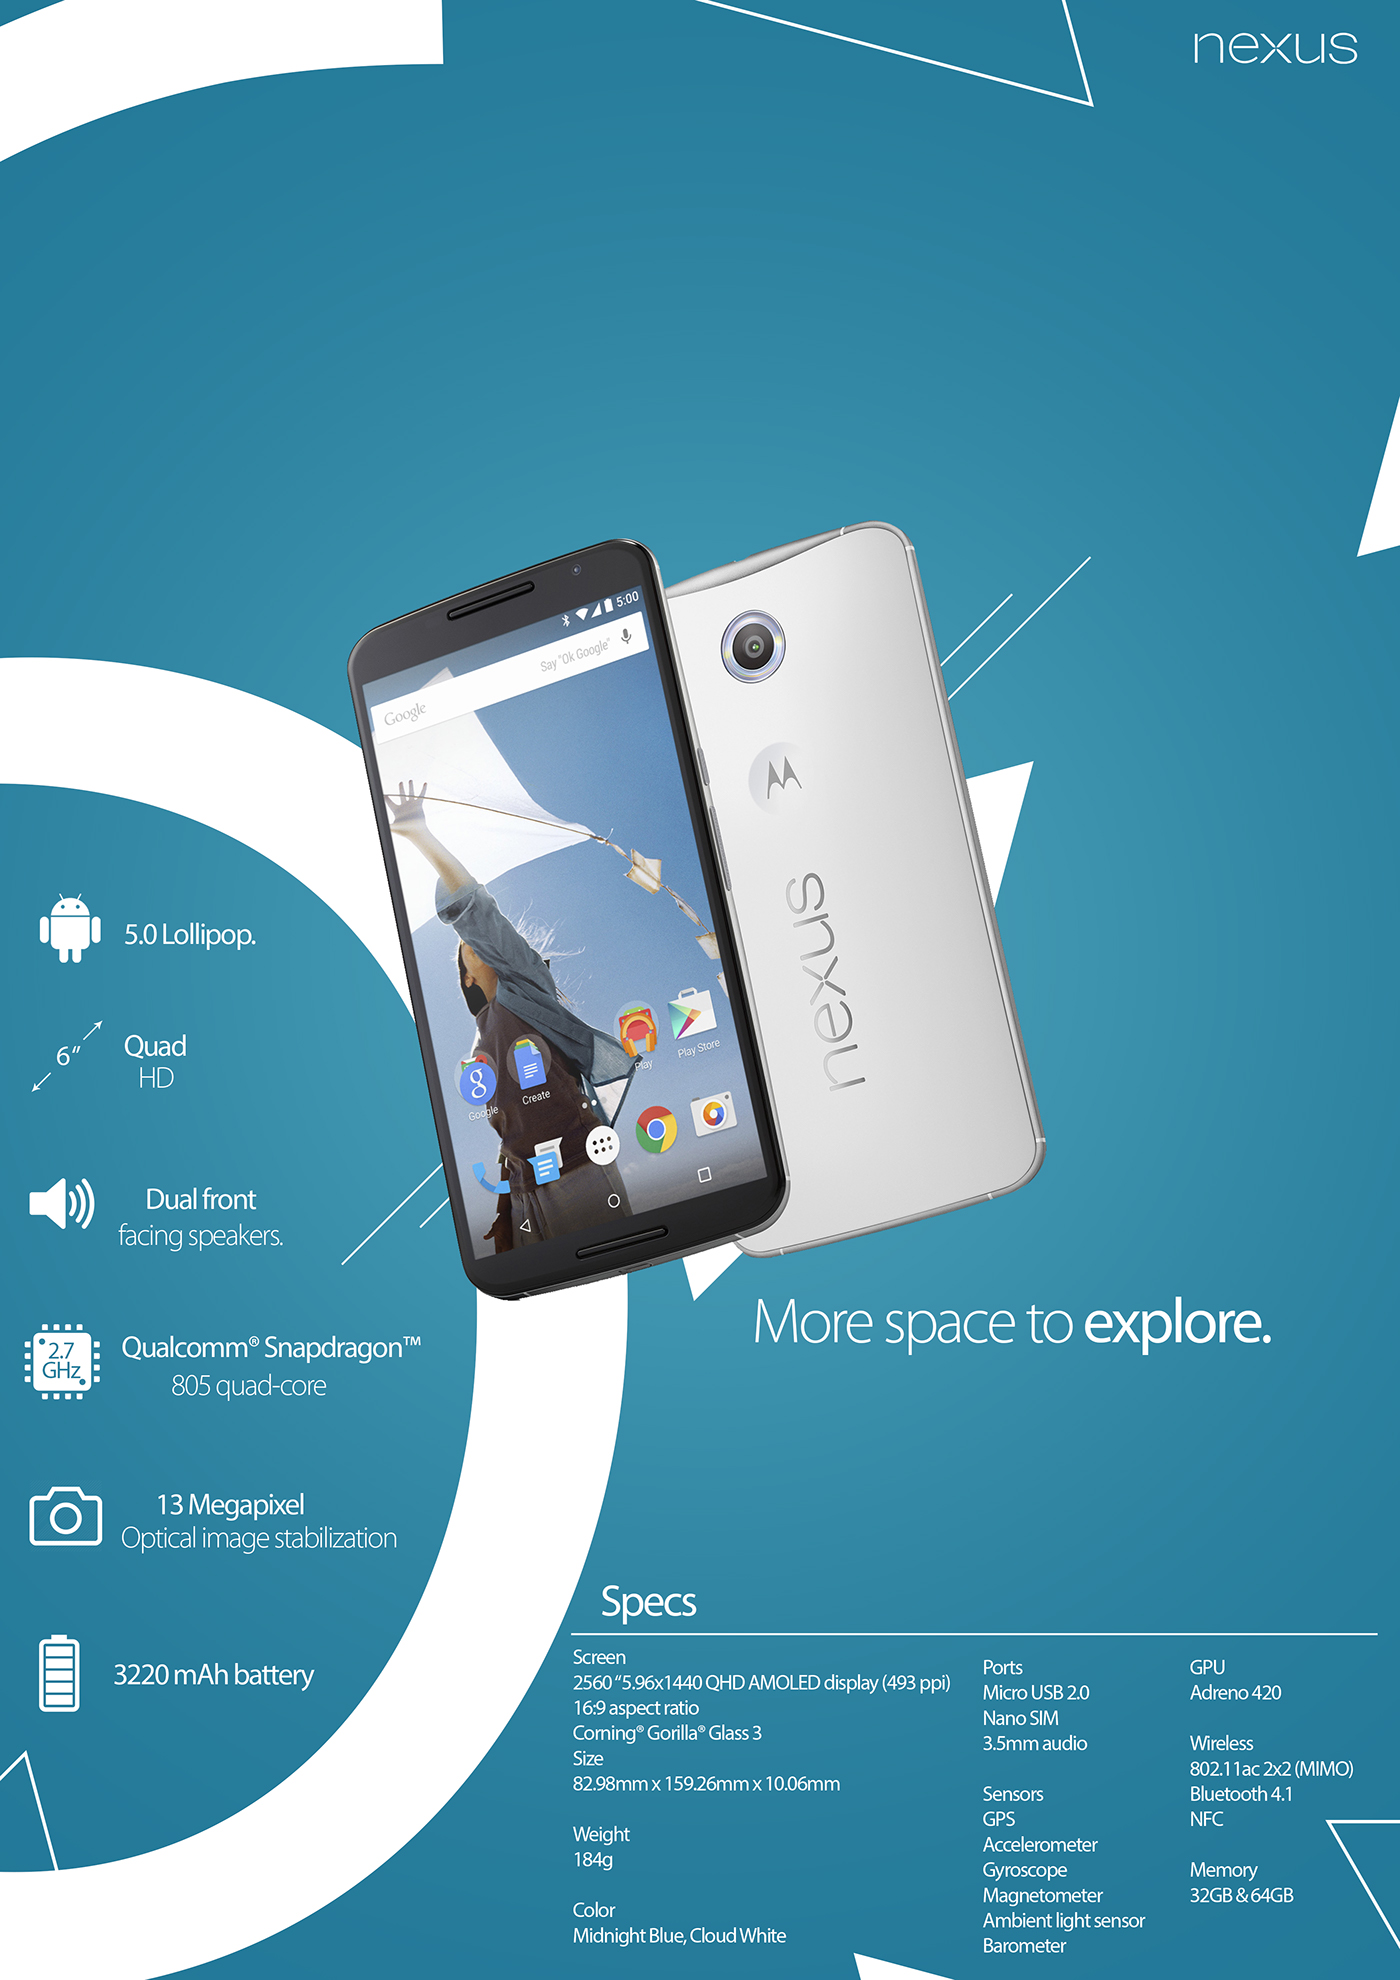 nexus 6 advertising concept